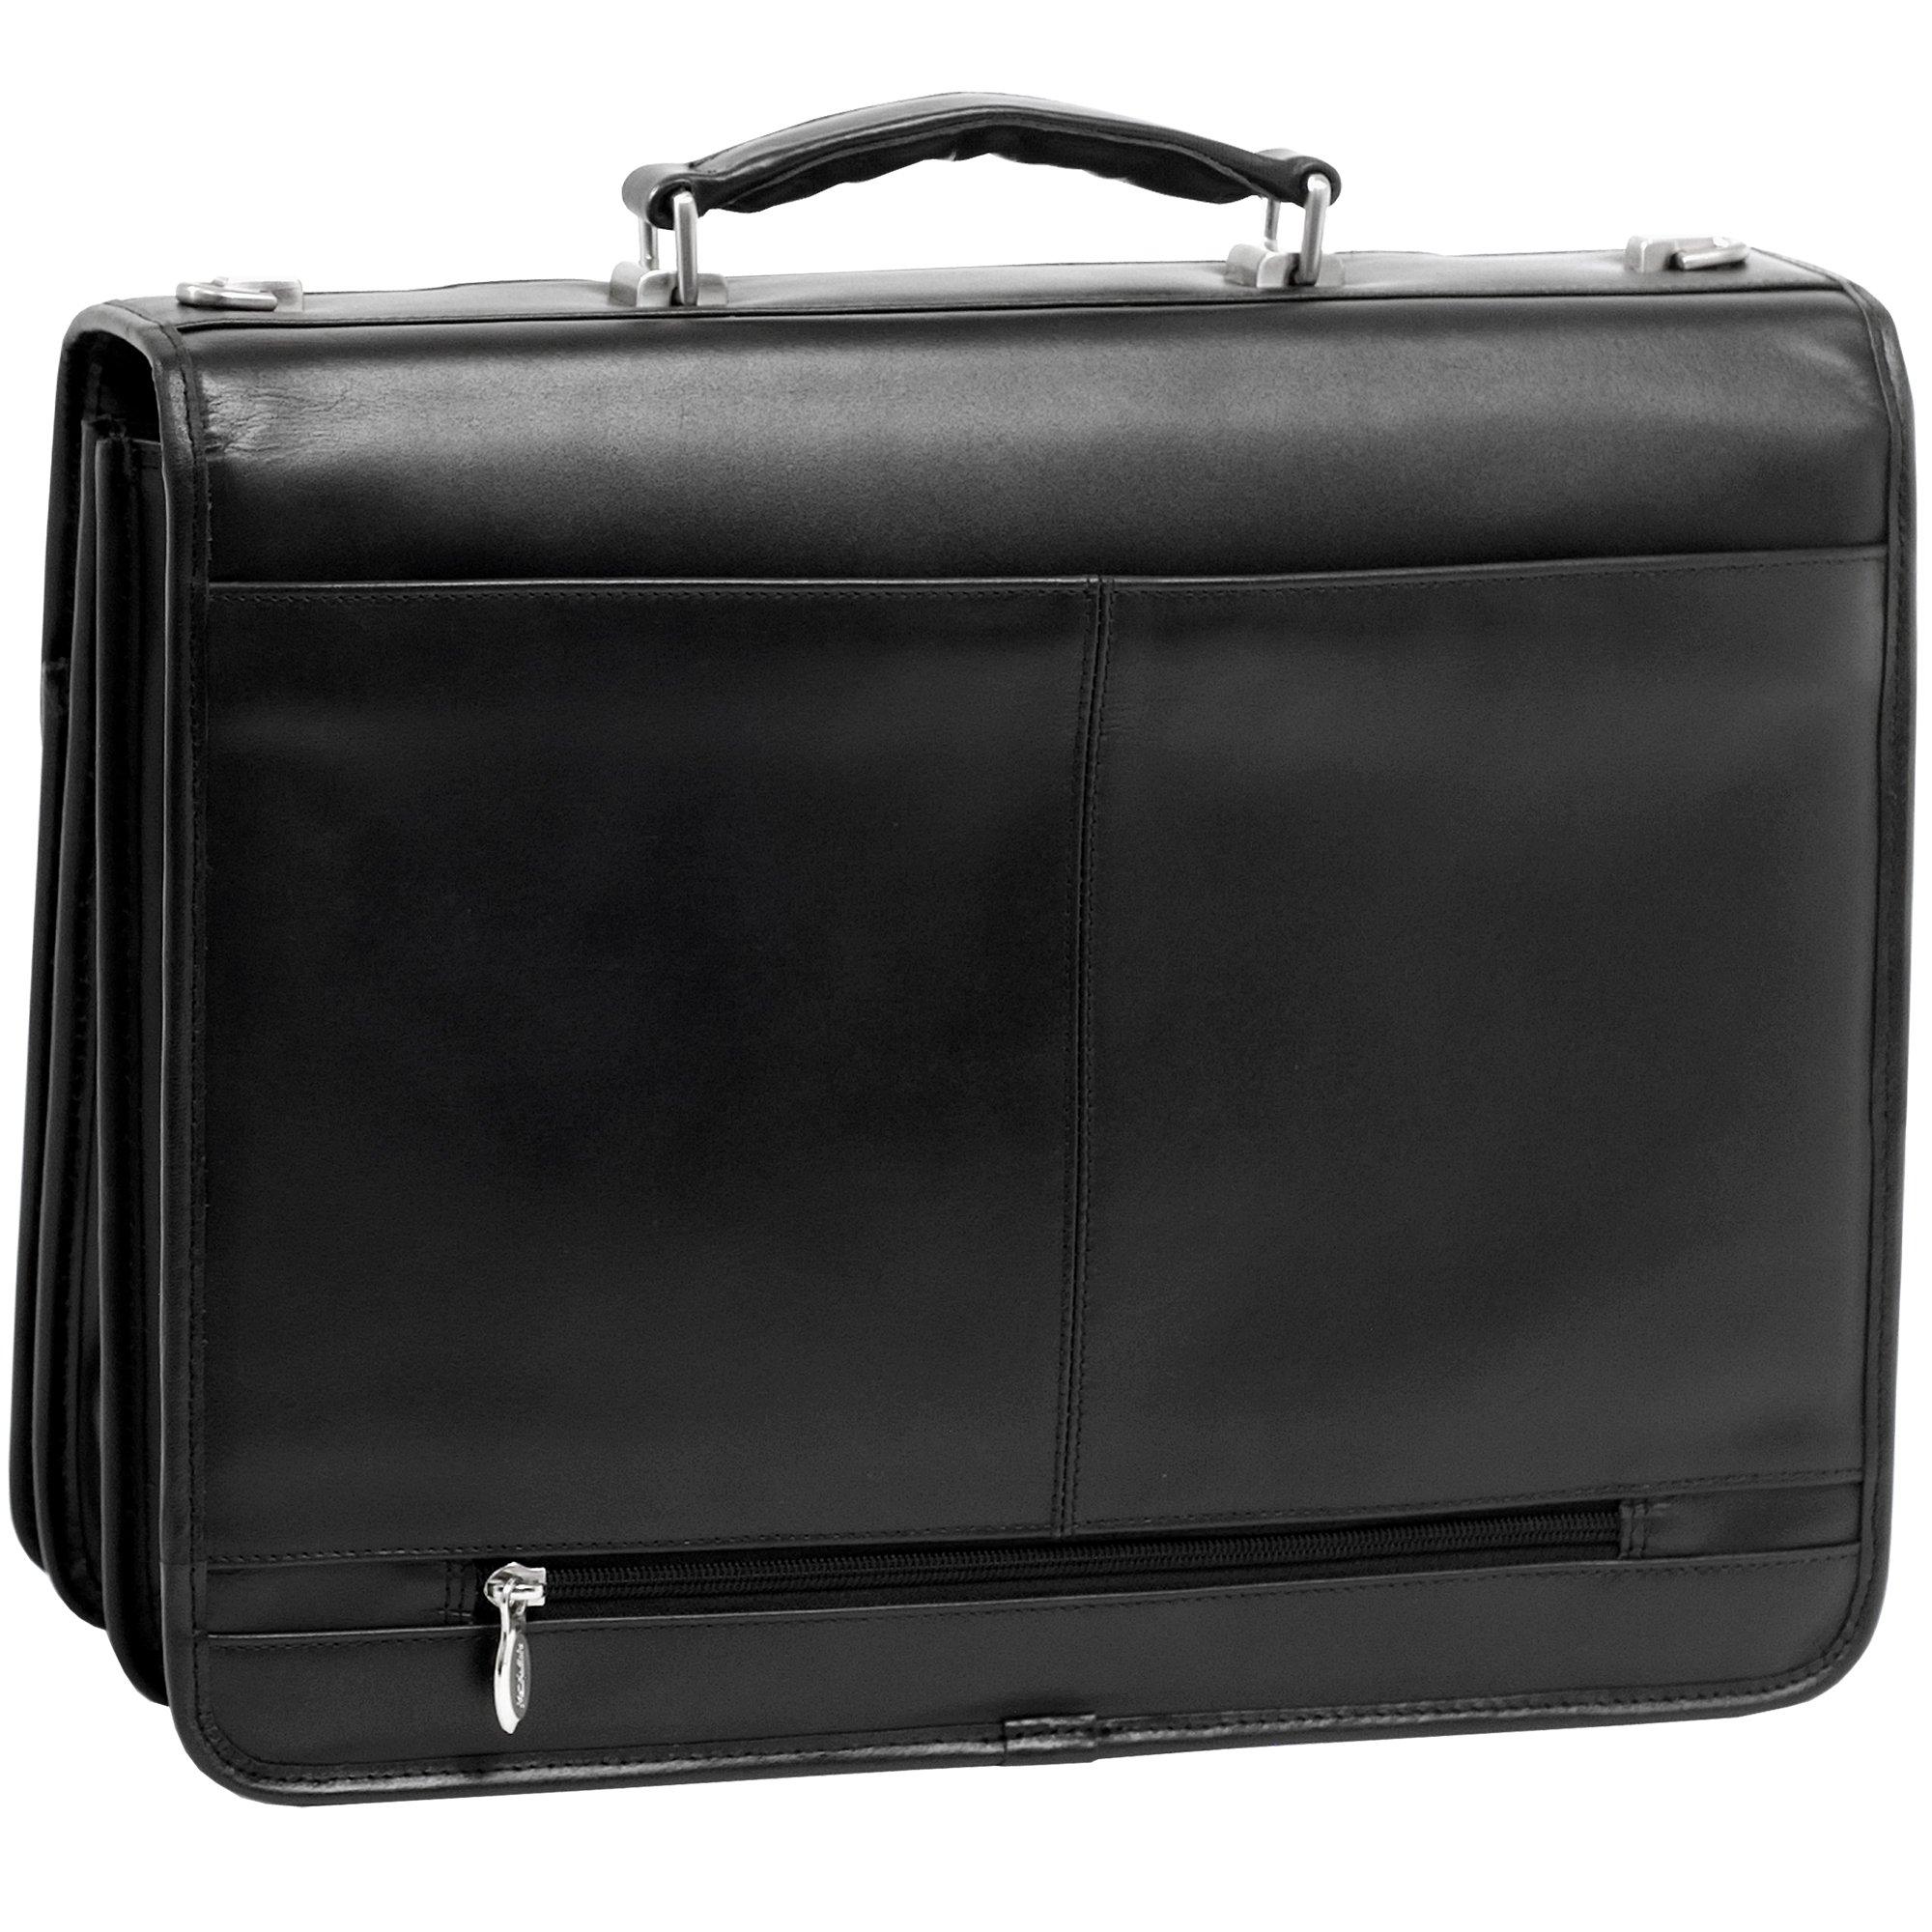 McKlein, V Series, FLOURNOY, Top Grain Cowhide Leather, 15'' Leather Double Compartment Laptop Briefcase, Black (85955) by McKleinUSA (Image #2)